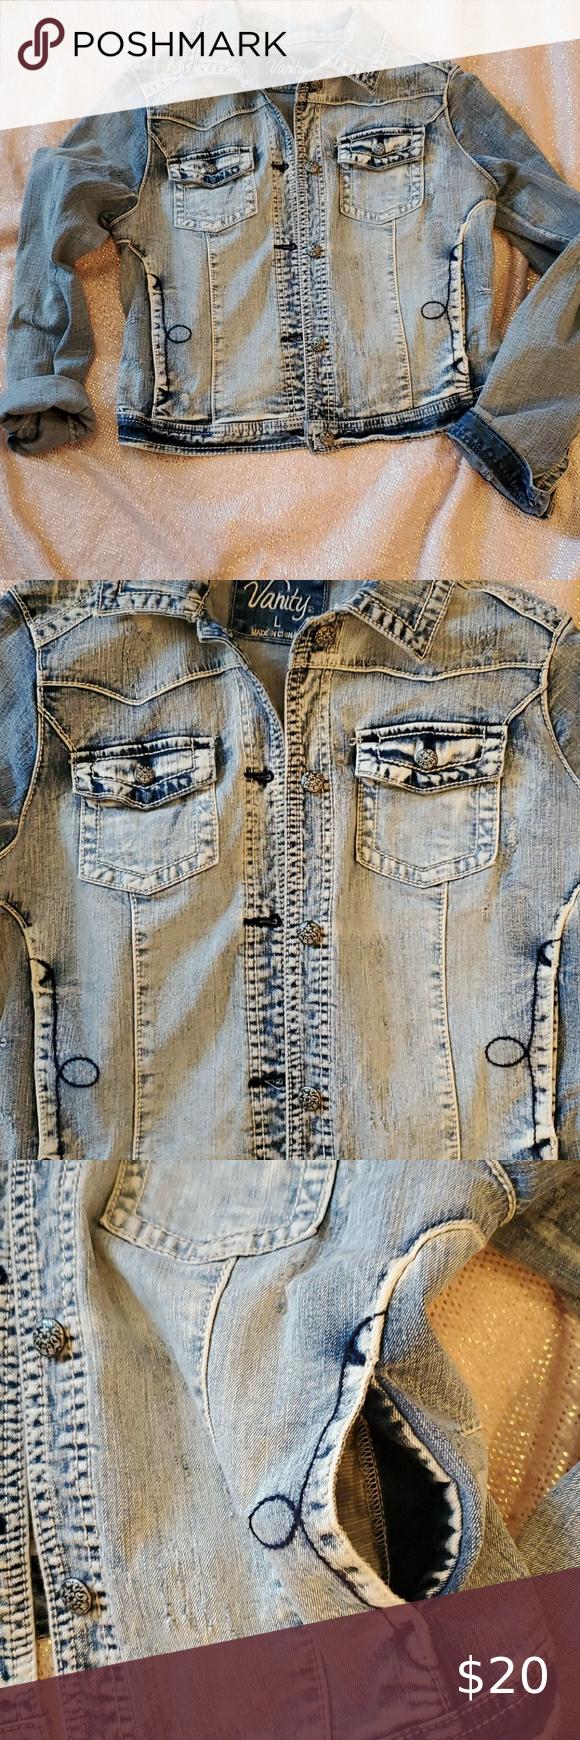 Vanity Faded Distressed Jean Jacket In 2020 Distressed Jean Jacket Jean Jacket Distressed Denim Jacket [ 1740 x 580 Pixel ]